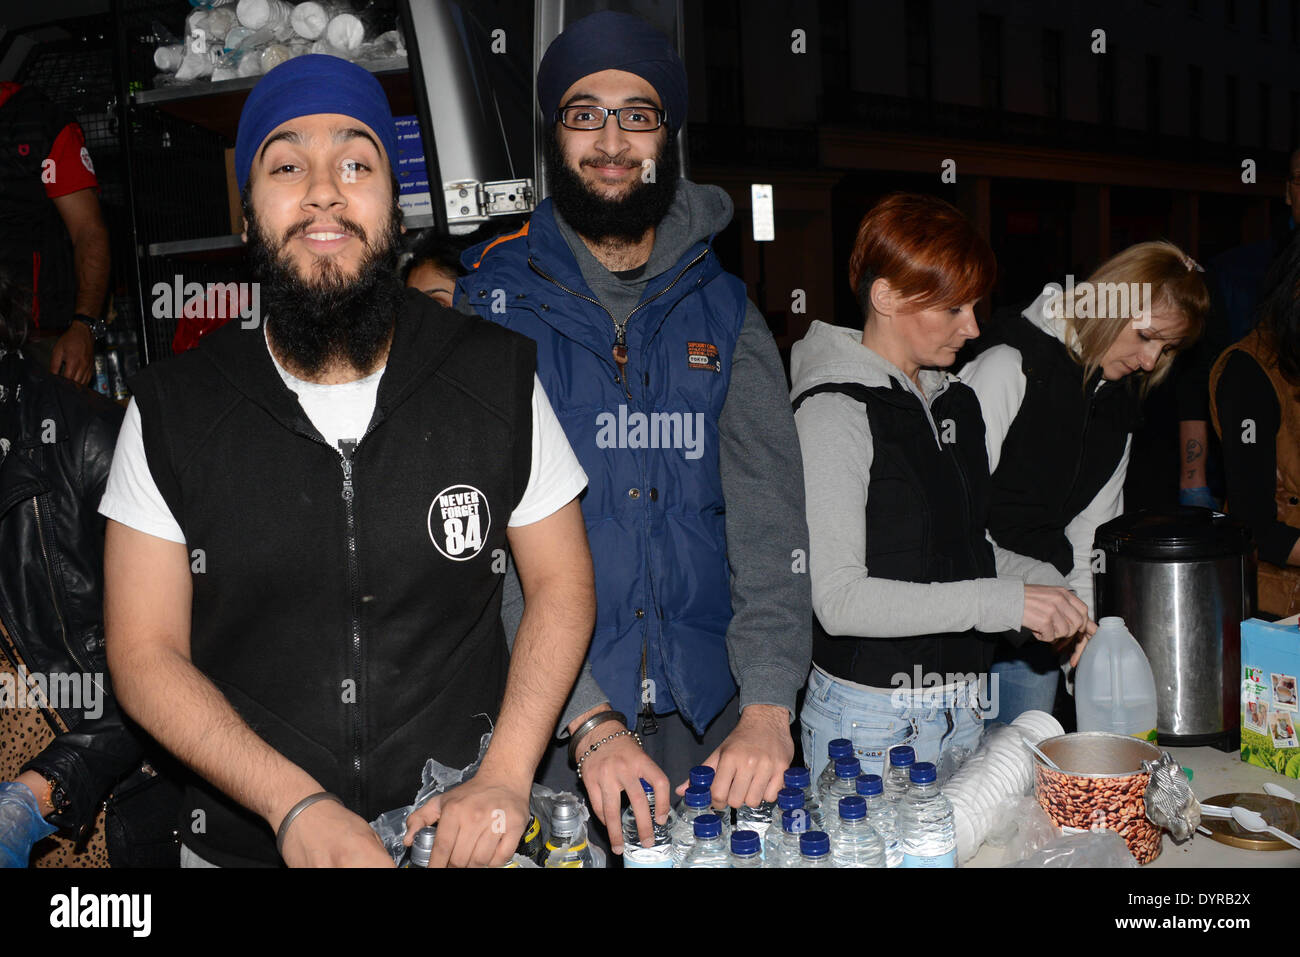 London, UK  24th April 14 : Sikh Welfare & Awareness Team (S W A T